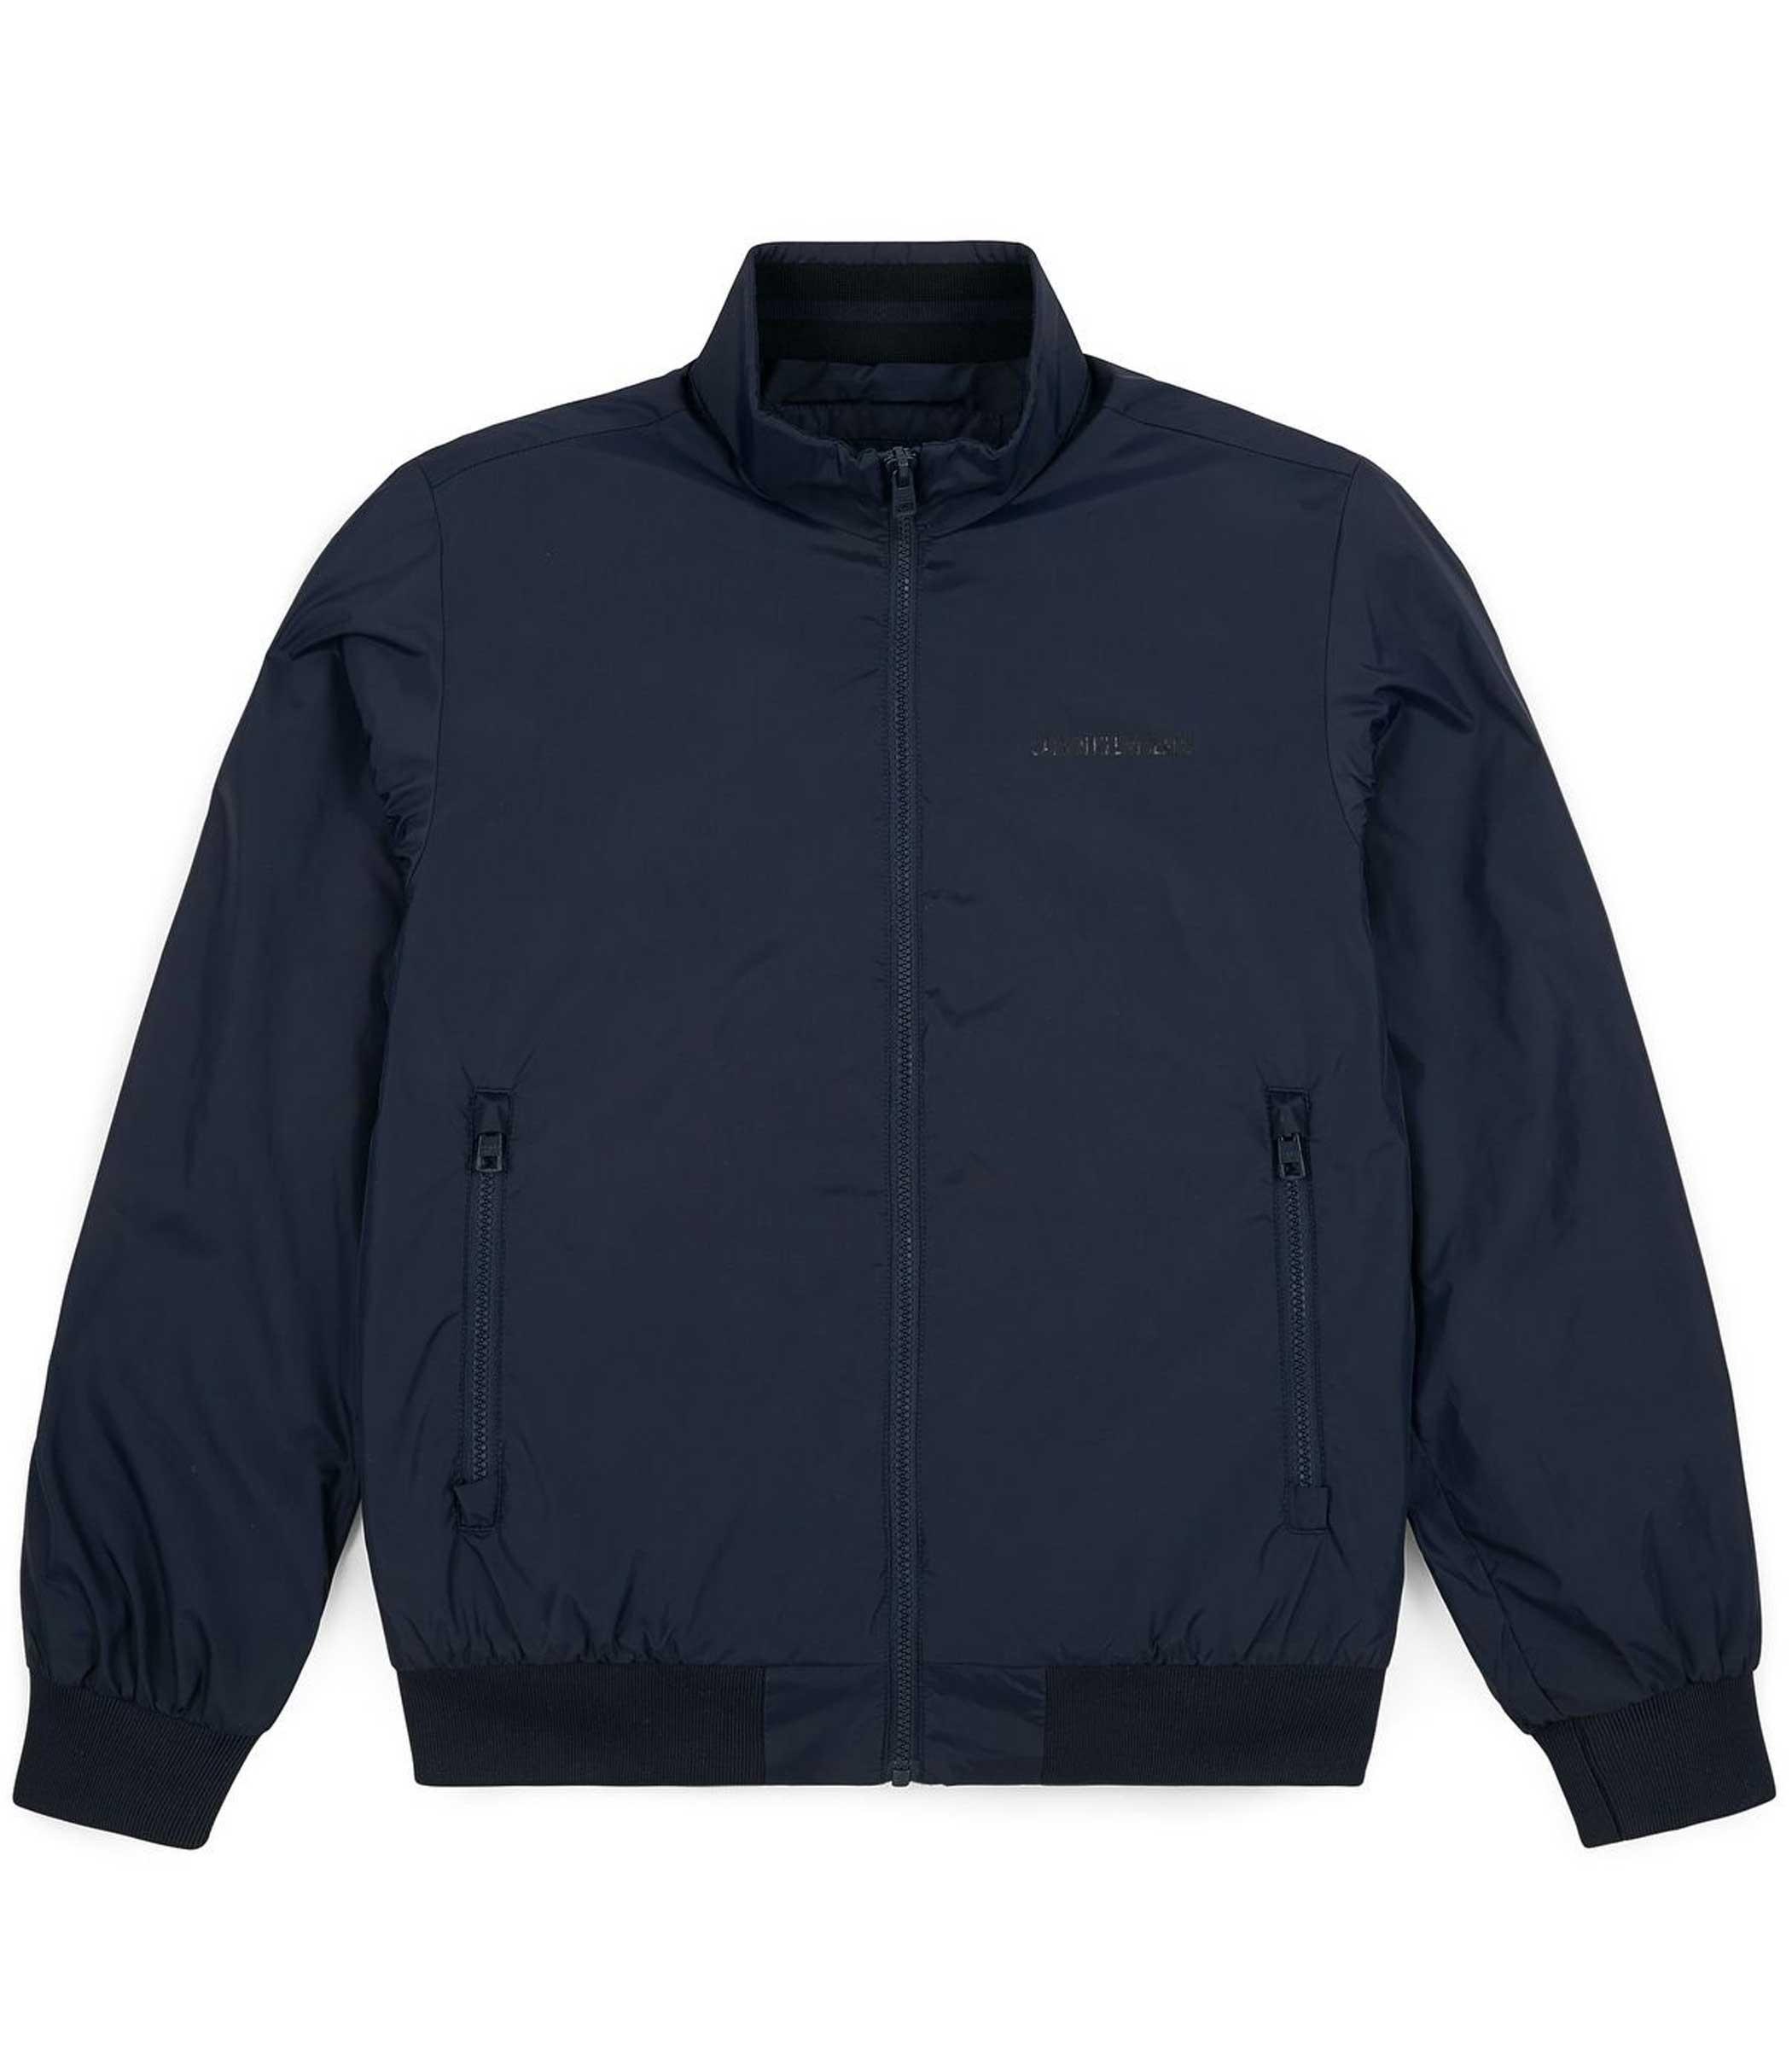 Giubbotto Bomber Calvin Klein Jeans in nylon da uomo rif. J30J310362 098b3d0a689